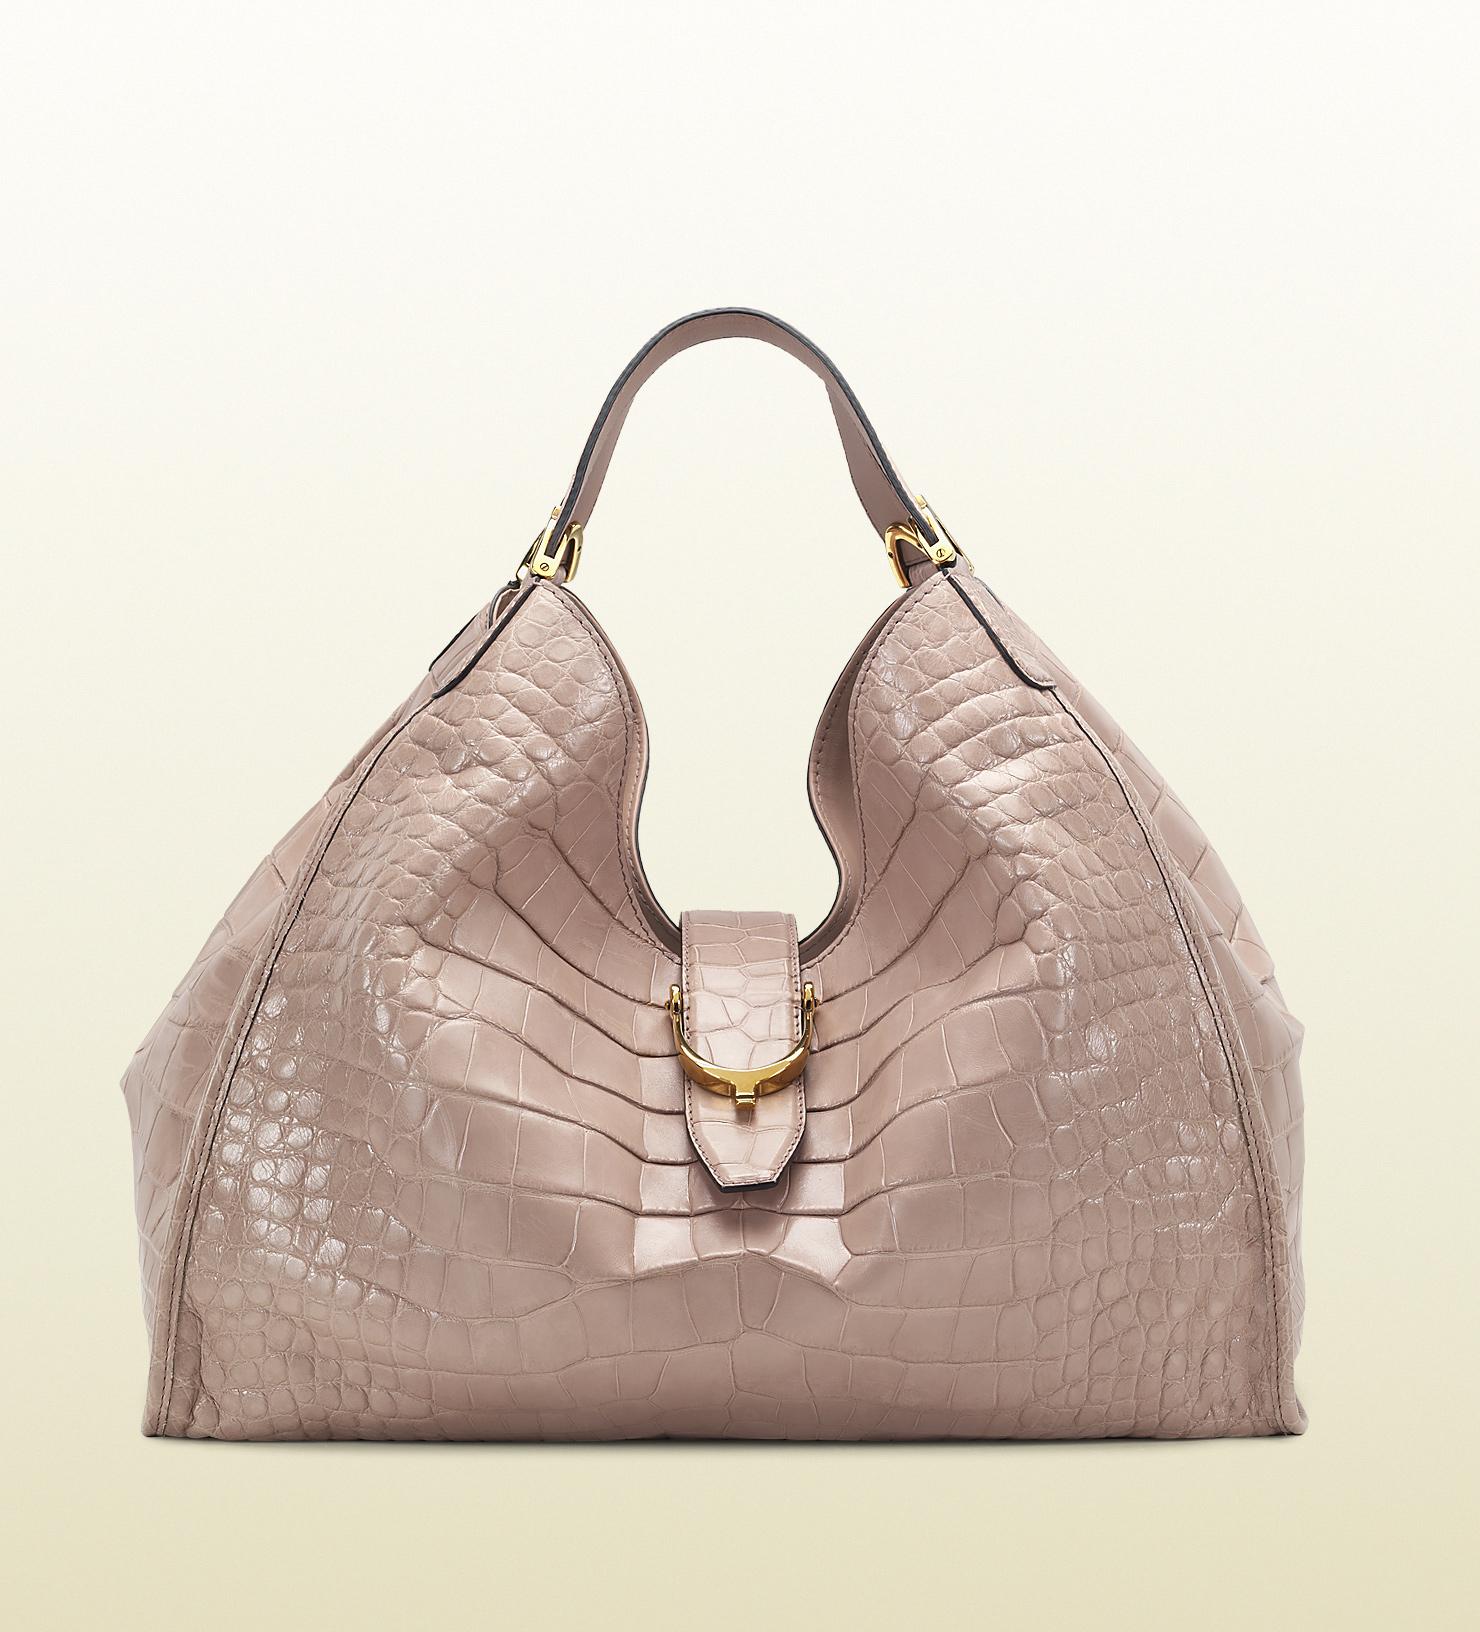 Lyst - Gucci Soft Stirrup Light Pink Crocodile Shoulder ...